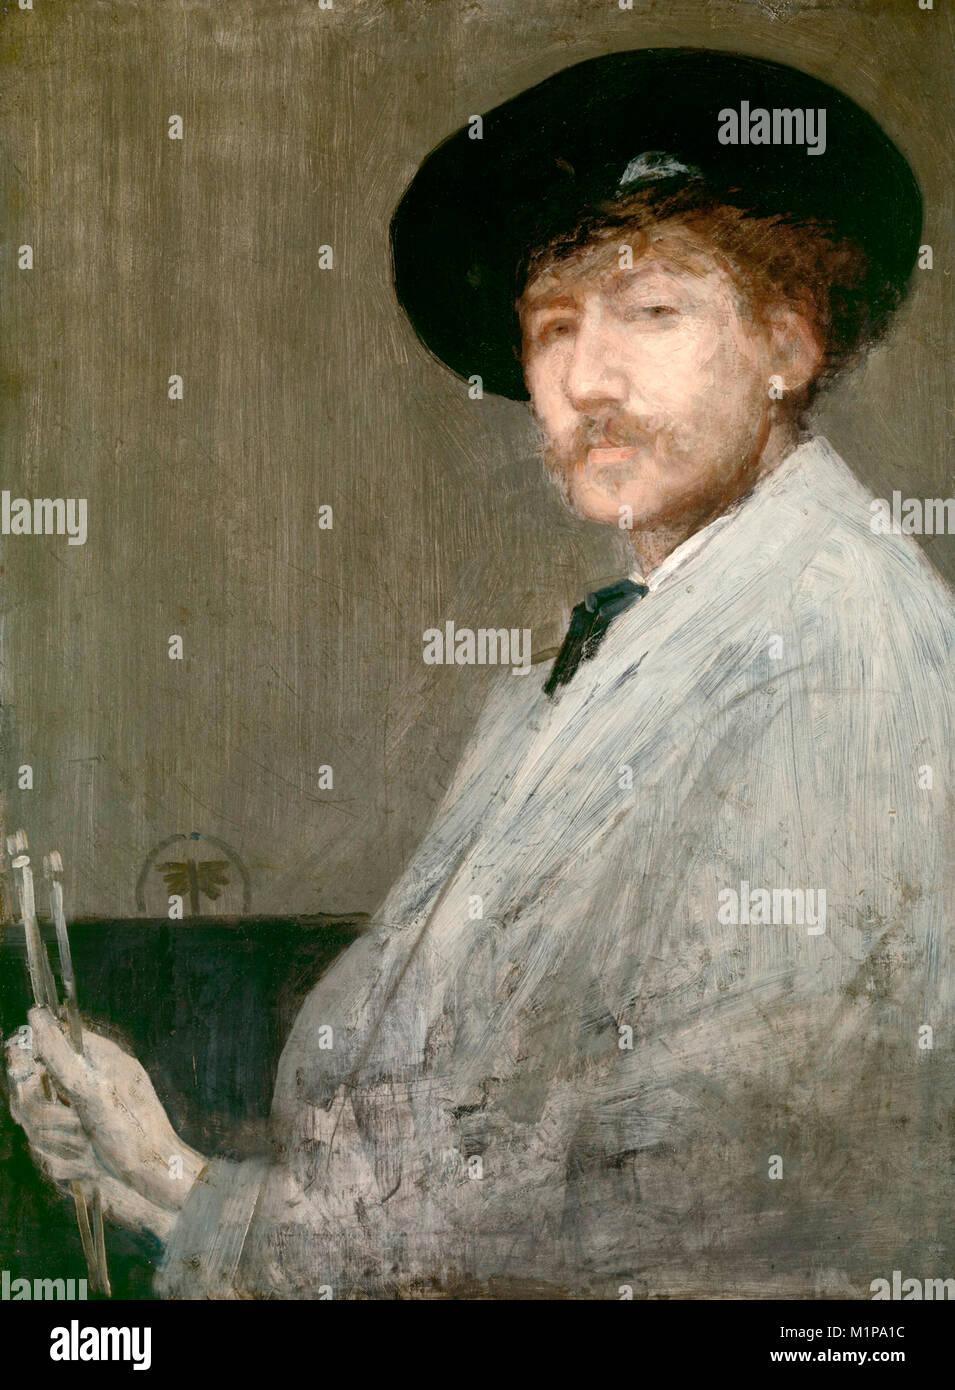 Portrait of Whistler, a self-portrait of James Abbott McNeill Whistler - Stock Image